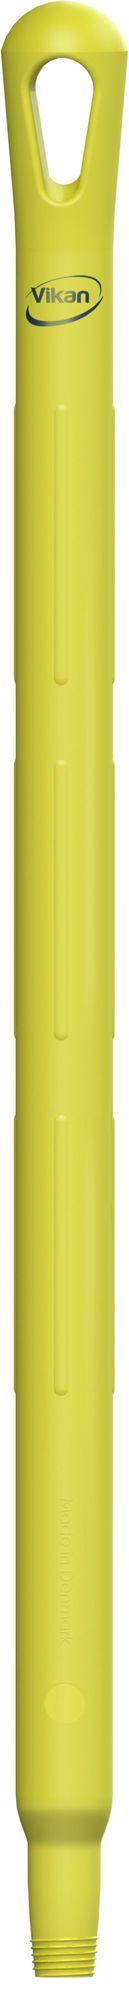 Vikan Hygiene korte steel 65cm -   29666